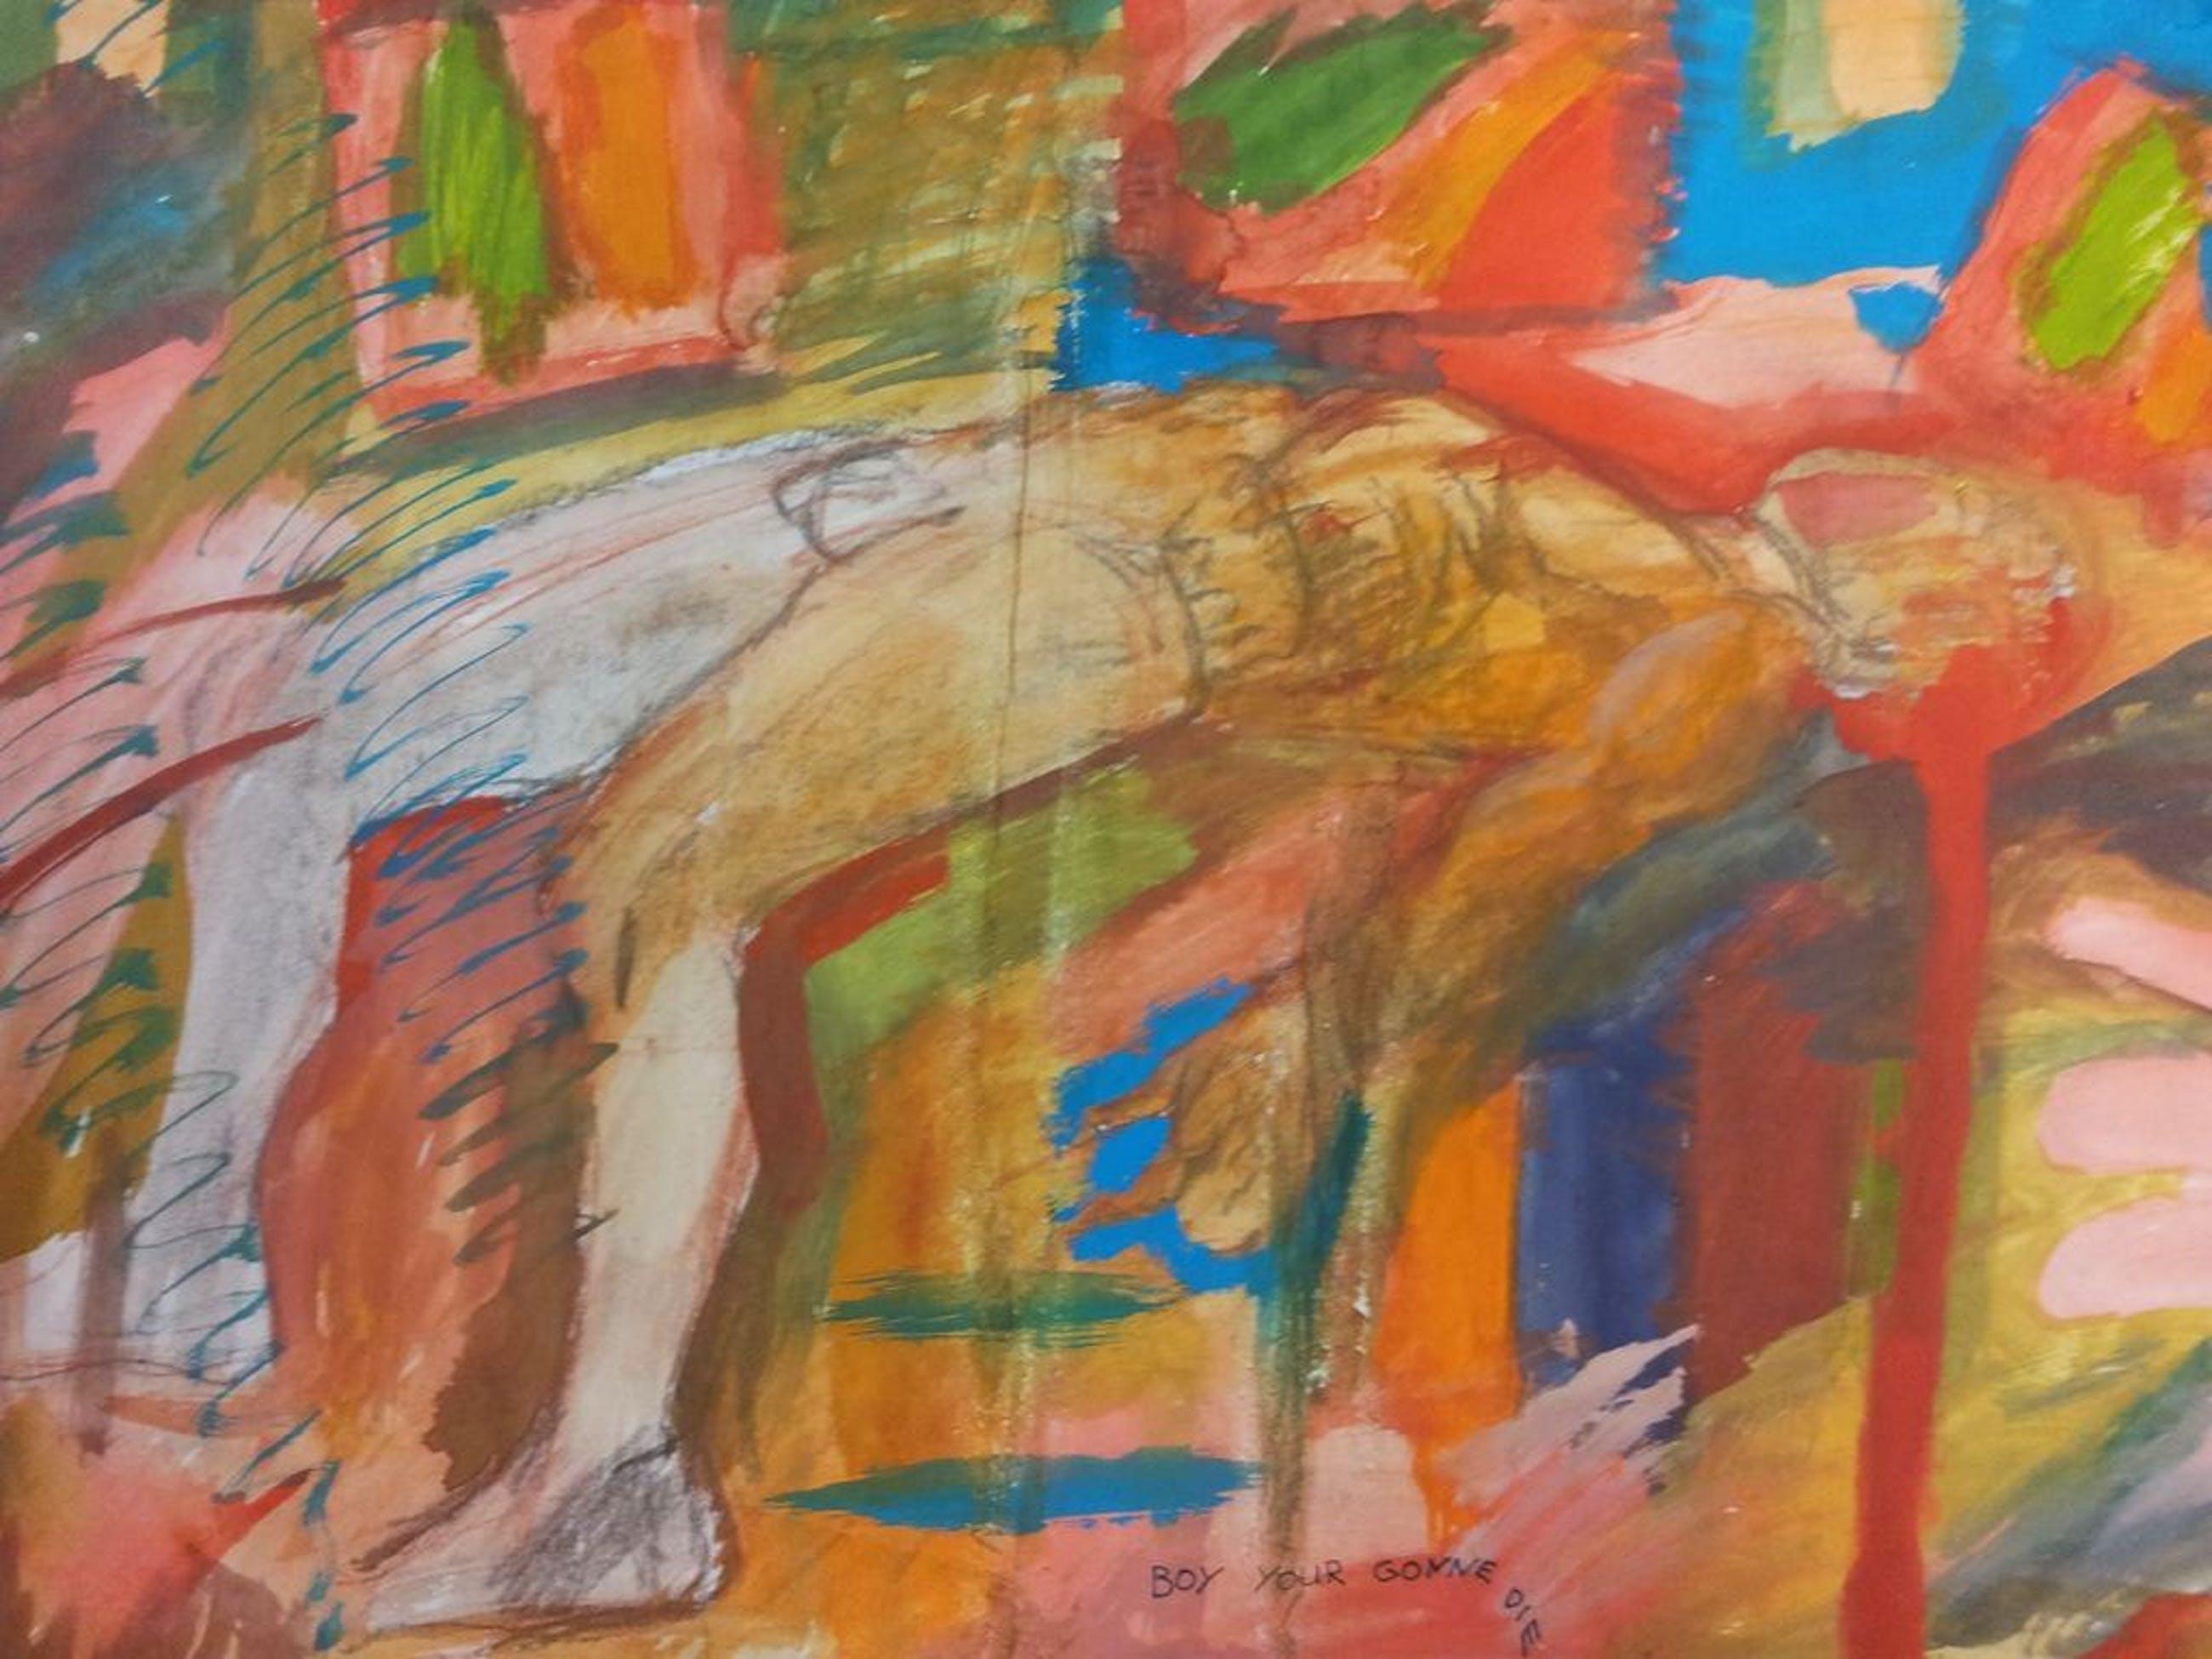 Peter Klashorst - '' Boy you gonne die '' Zeldzaam Vroeg werk !  Gemengde Techniek / Maroufle papier op Canvas - Gesigneerd en gedateerd 1981  kopen? Bied vanaf 125!